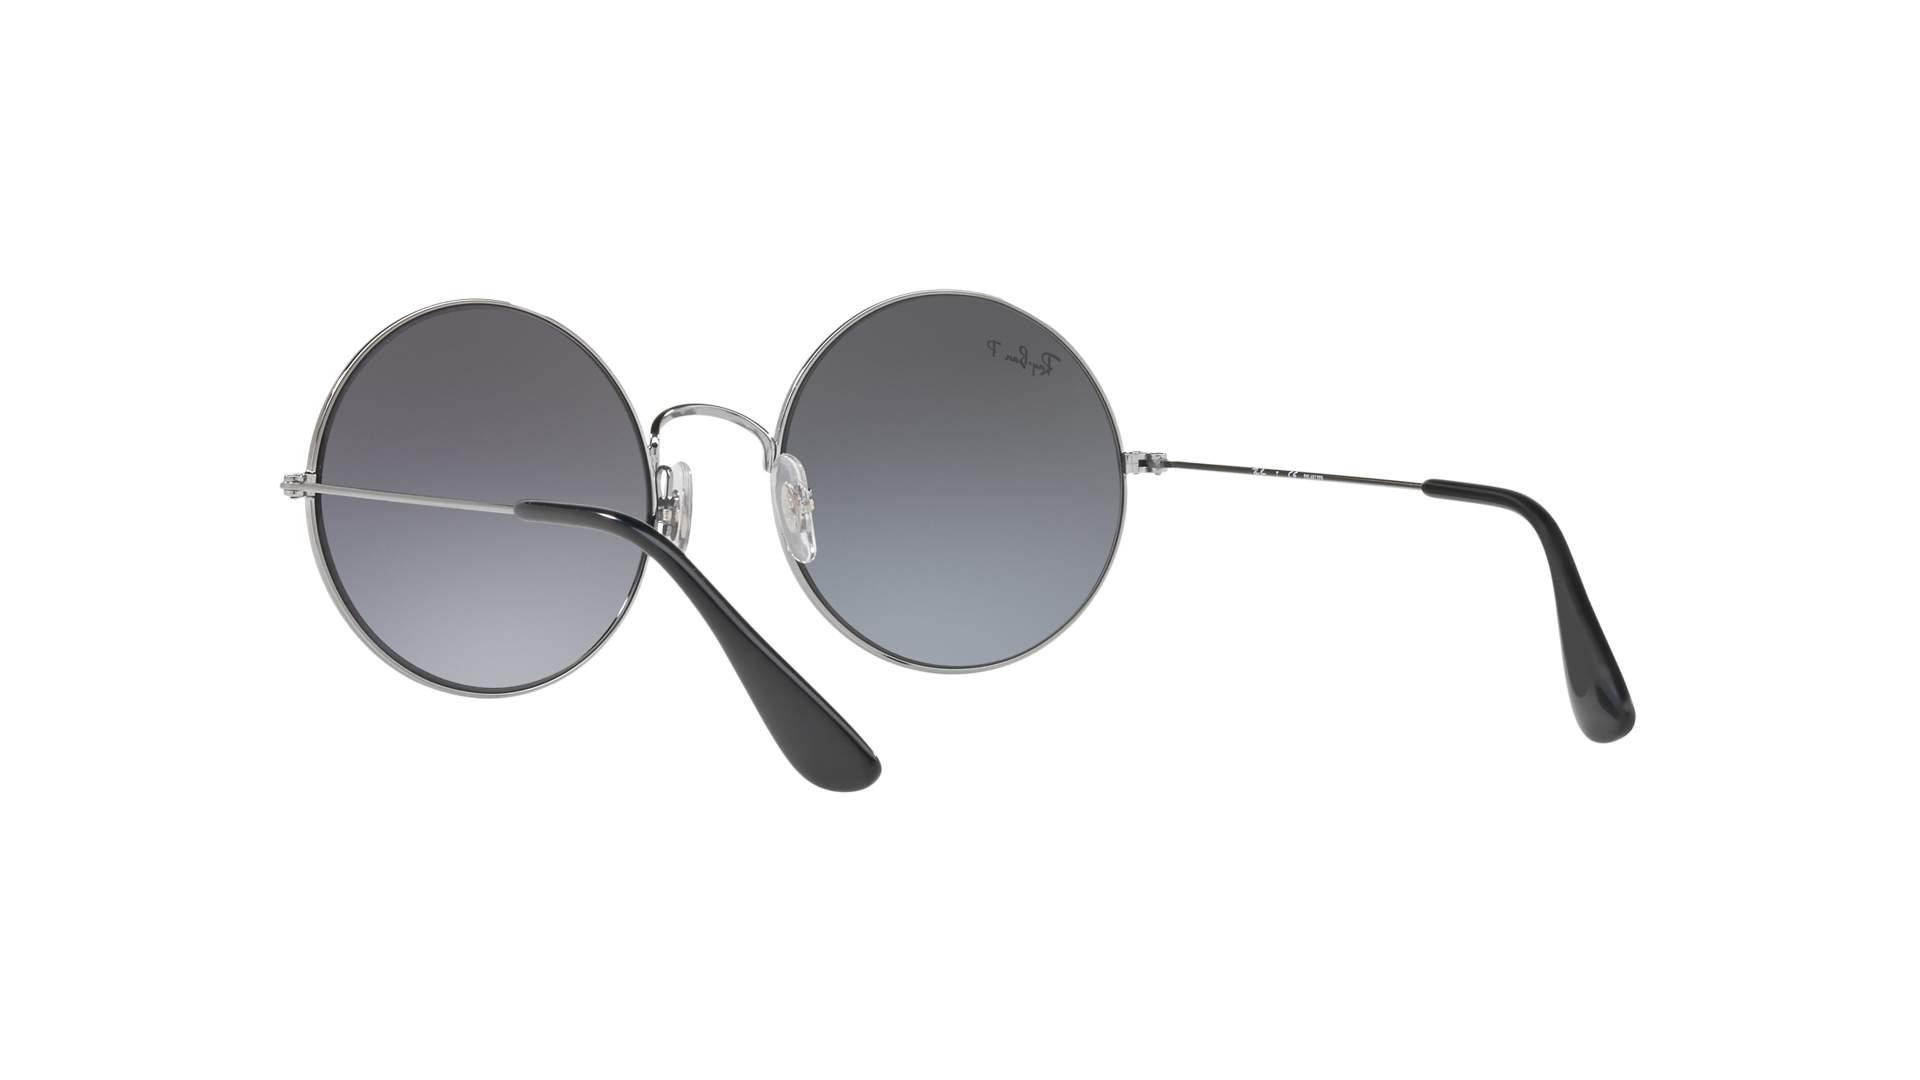 c59a0c566b Sunglasses Ray-Ban Ja-jo Silver RB3592 004 T3 50-20 Medium Polarized  Gradient